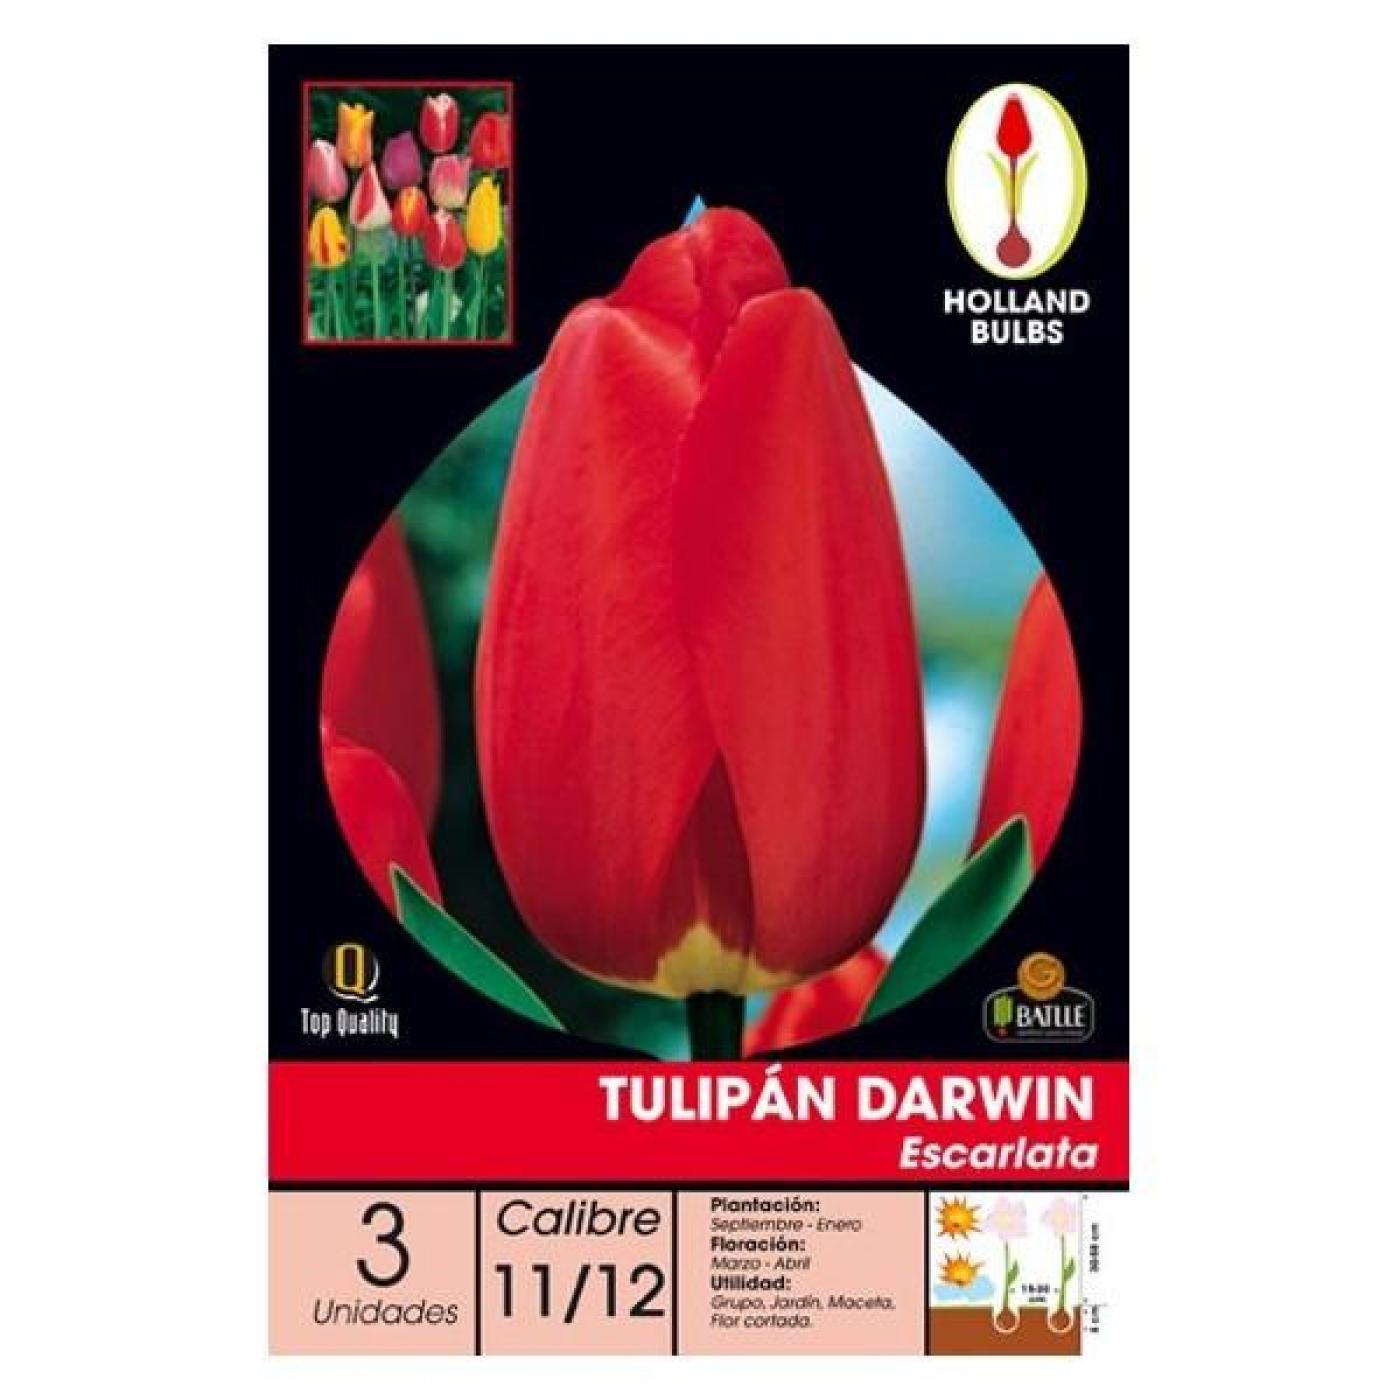 Piantare I Bulbi Di Tulipani bulbi di tulipano - tutte le offerte : cascare a fagiolo